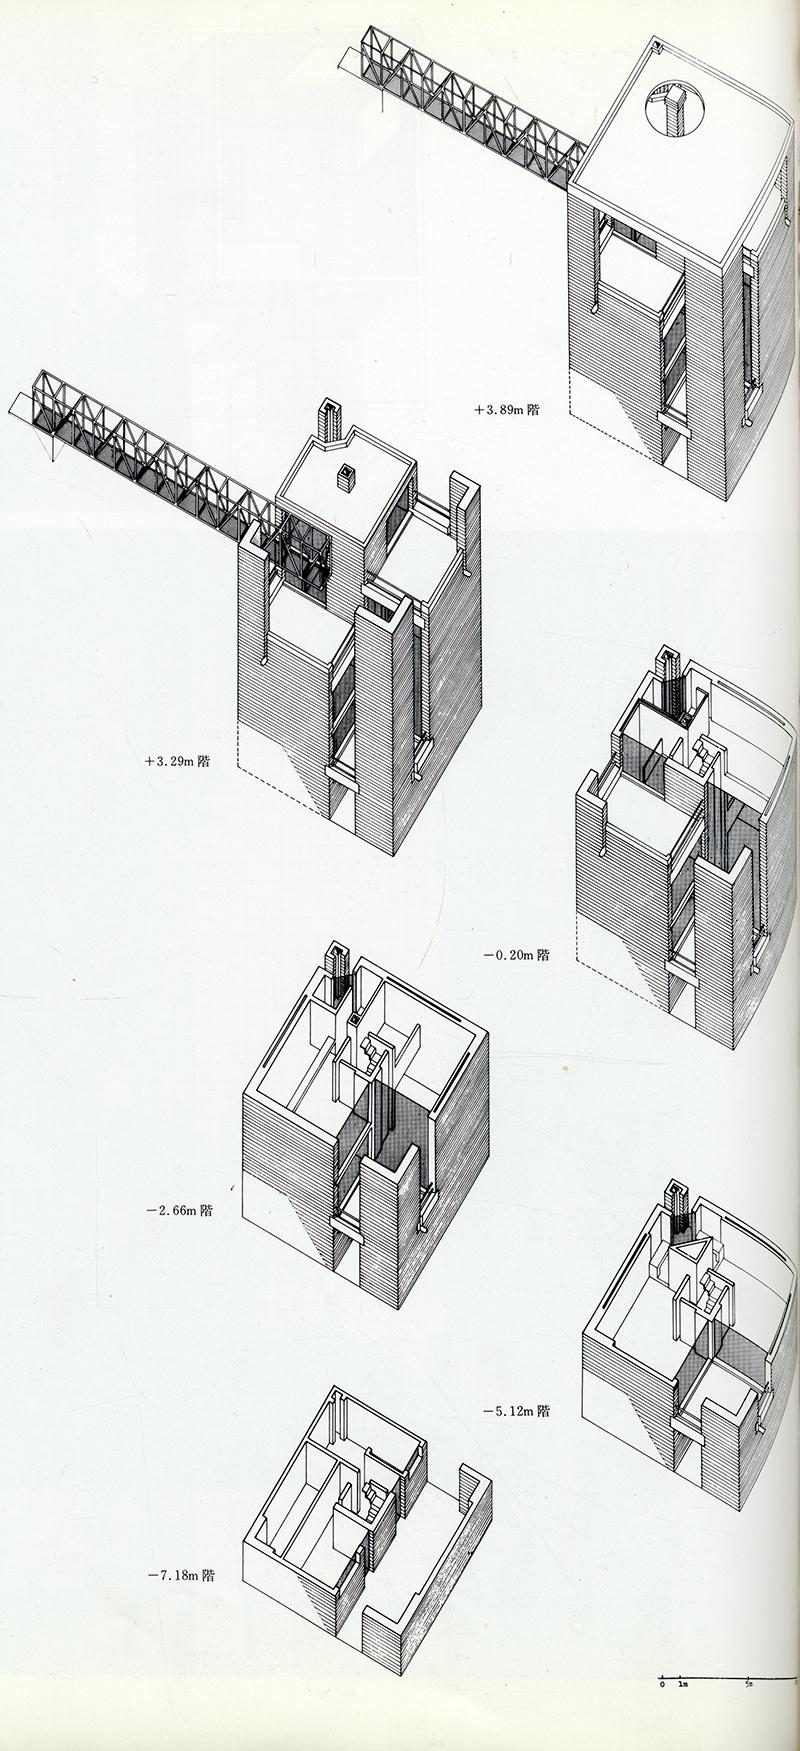 Mario Botta. GA Houses. 1 1976, 162